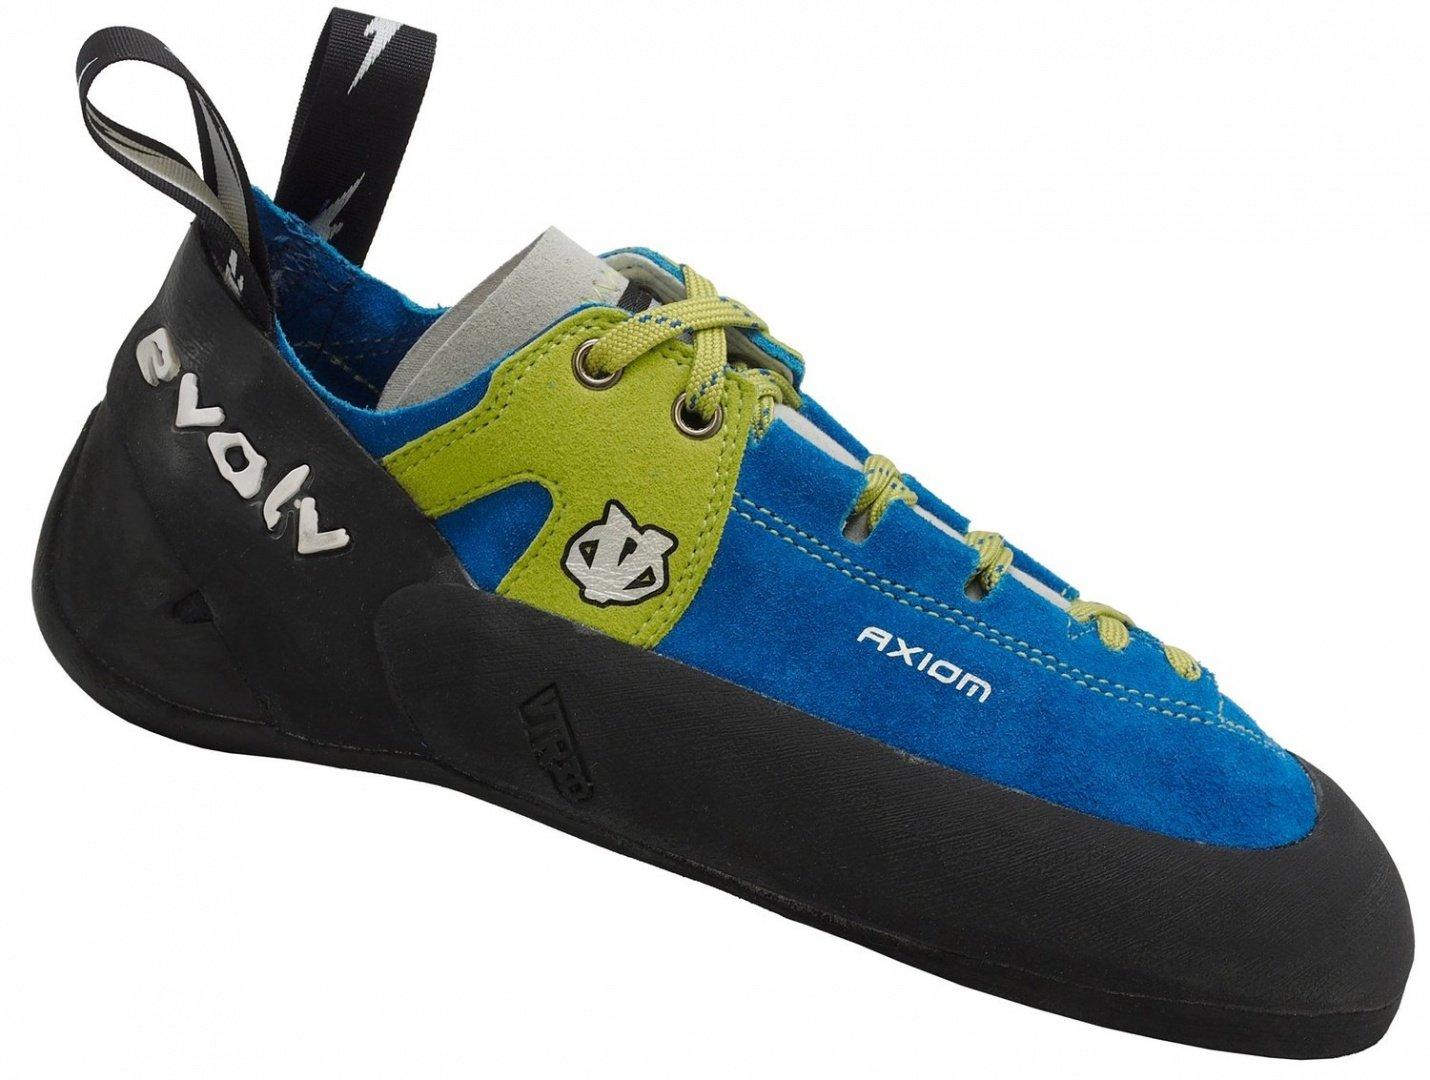 Evolv Axiom Climbing Shoe with FREE Climbing DVD ($30 Value) (Men's 9.5) by Evolv